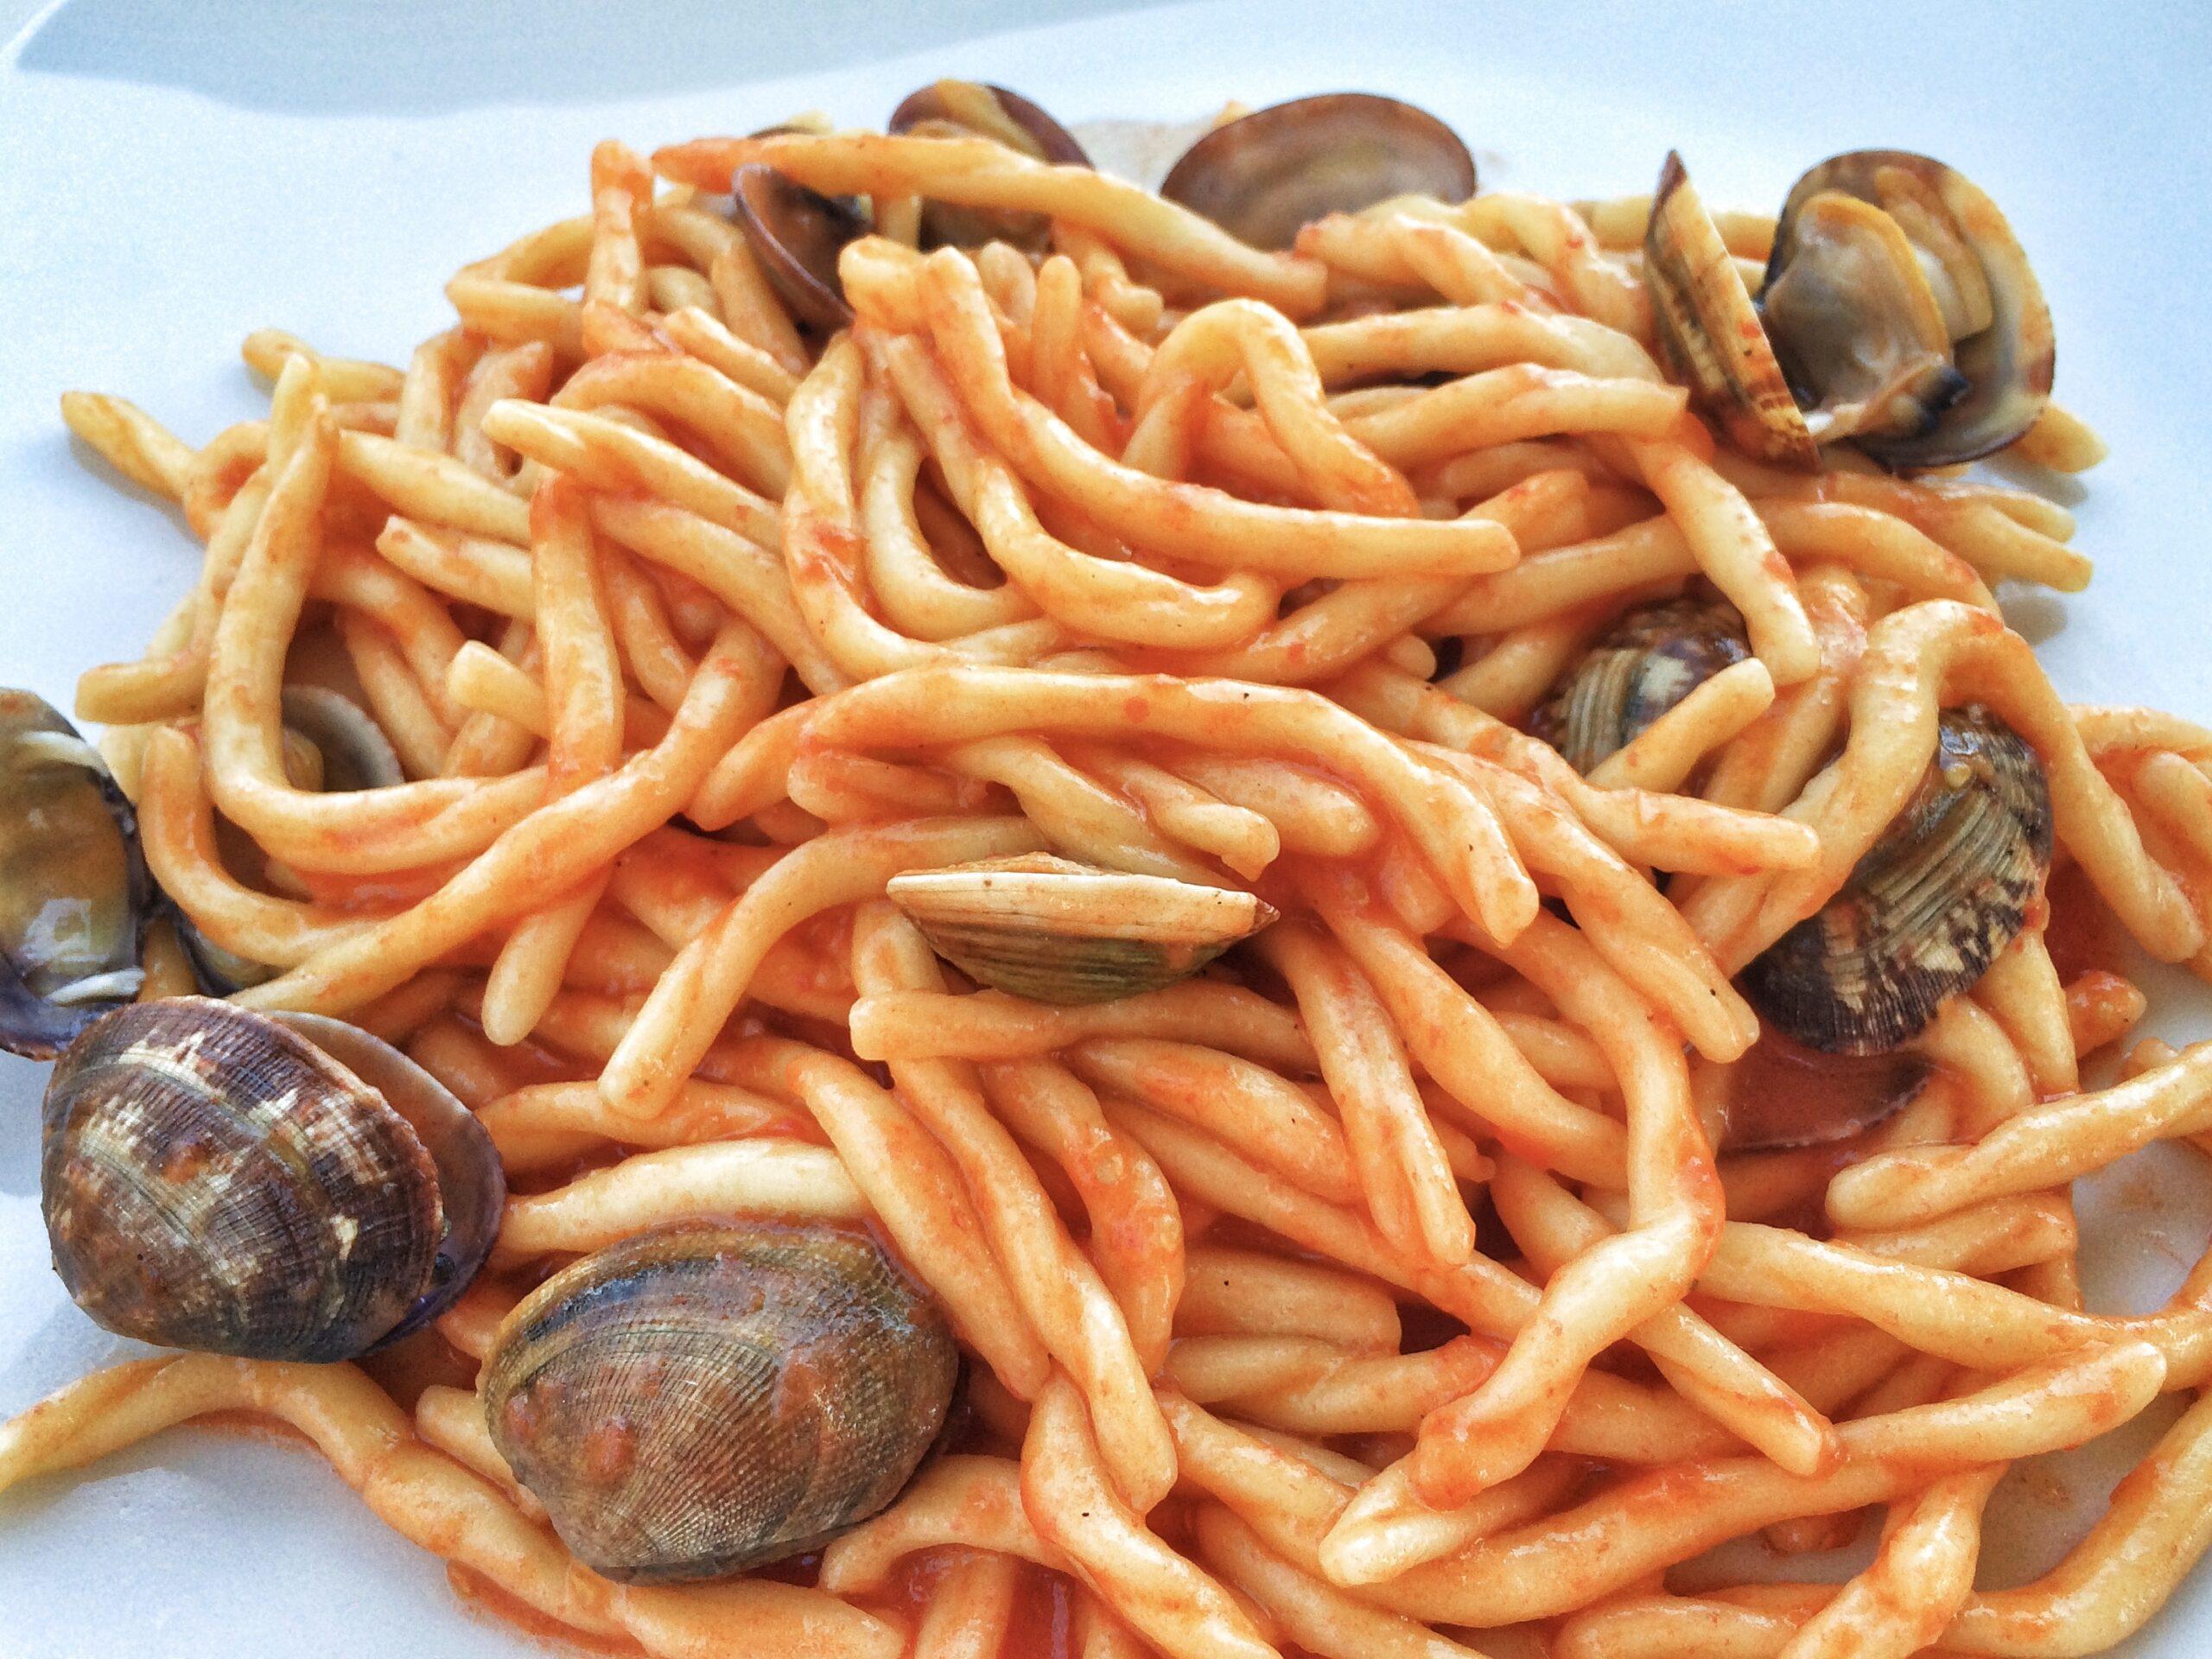 Seafood pasta in Puglia.